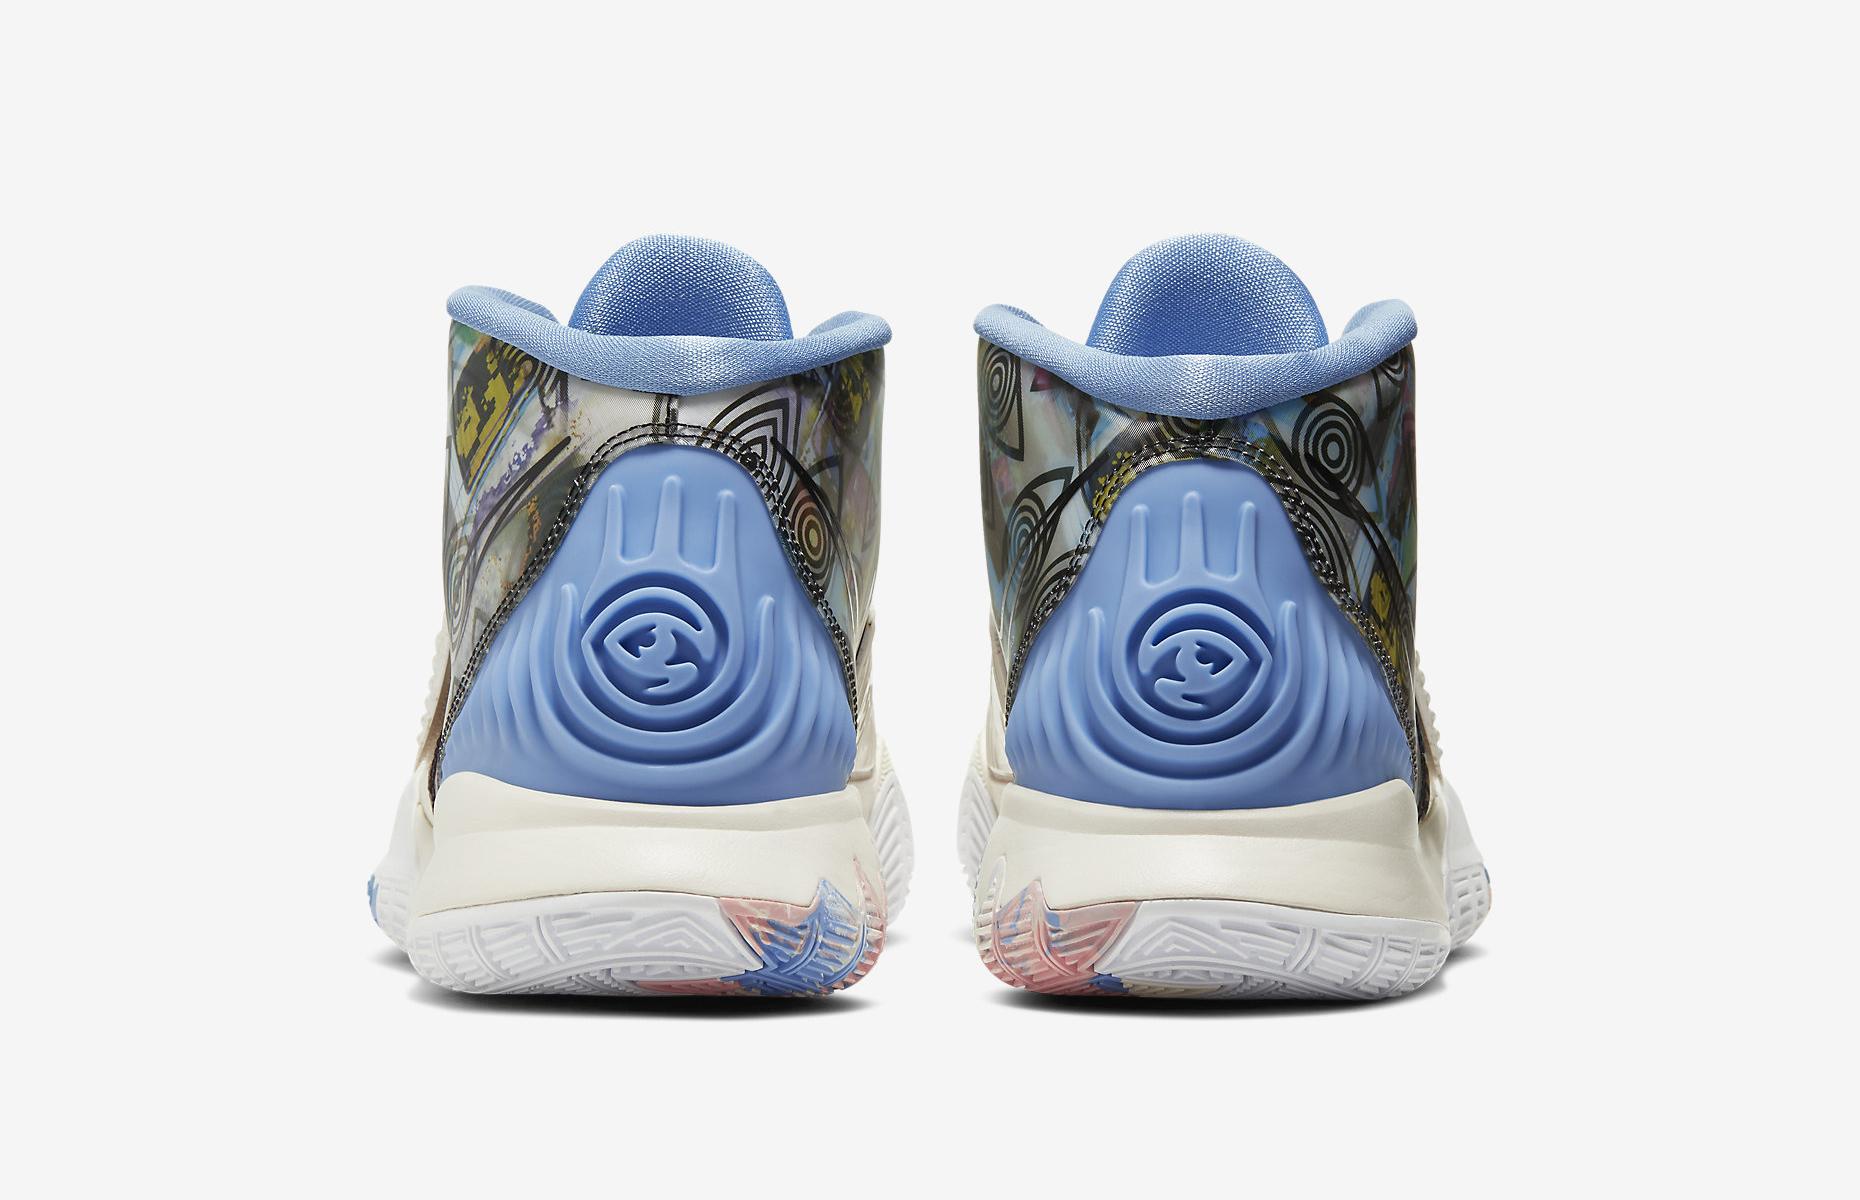 Nike Kyrie 6 Preheat Los Angeles CN9839-101 Release